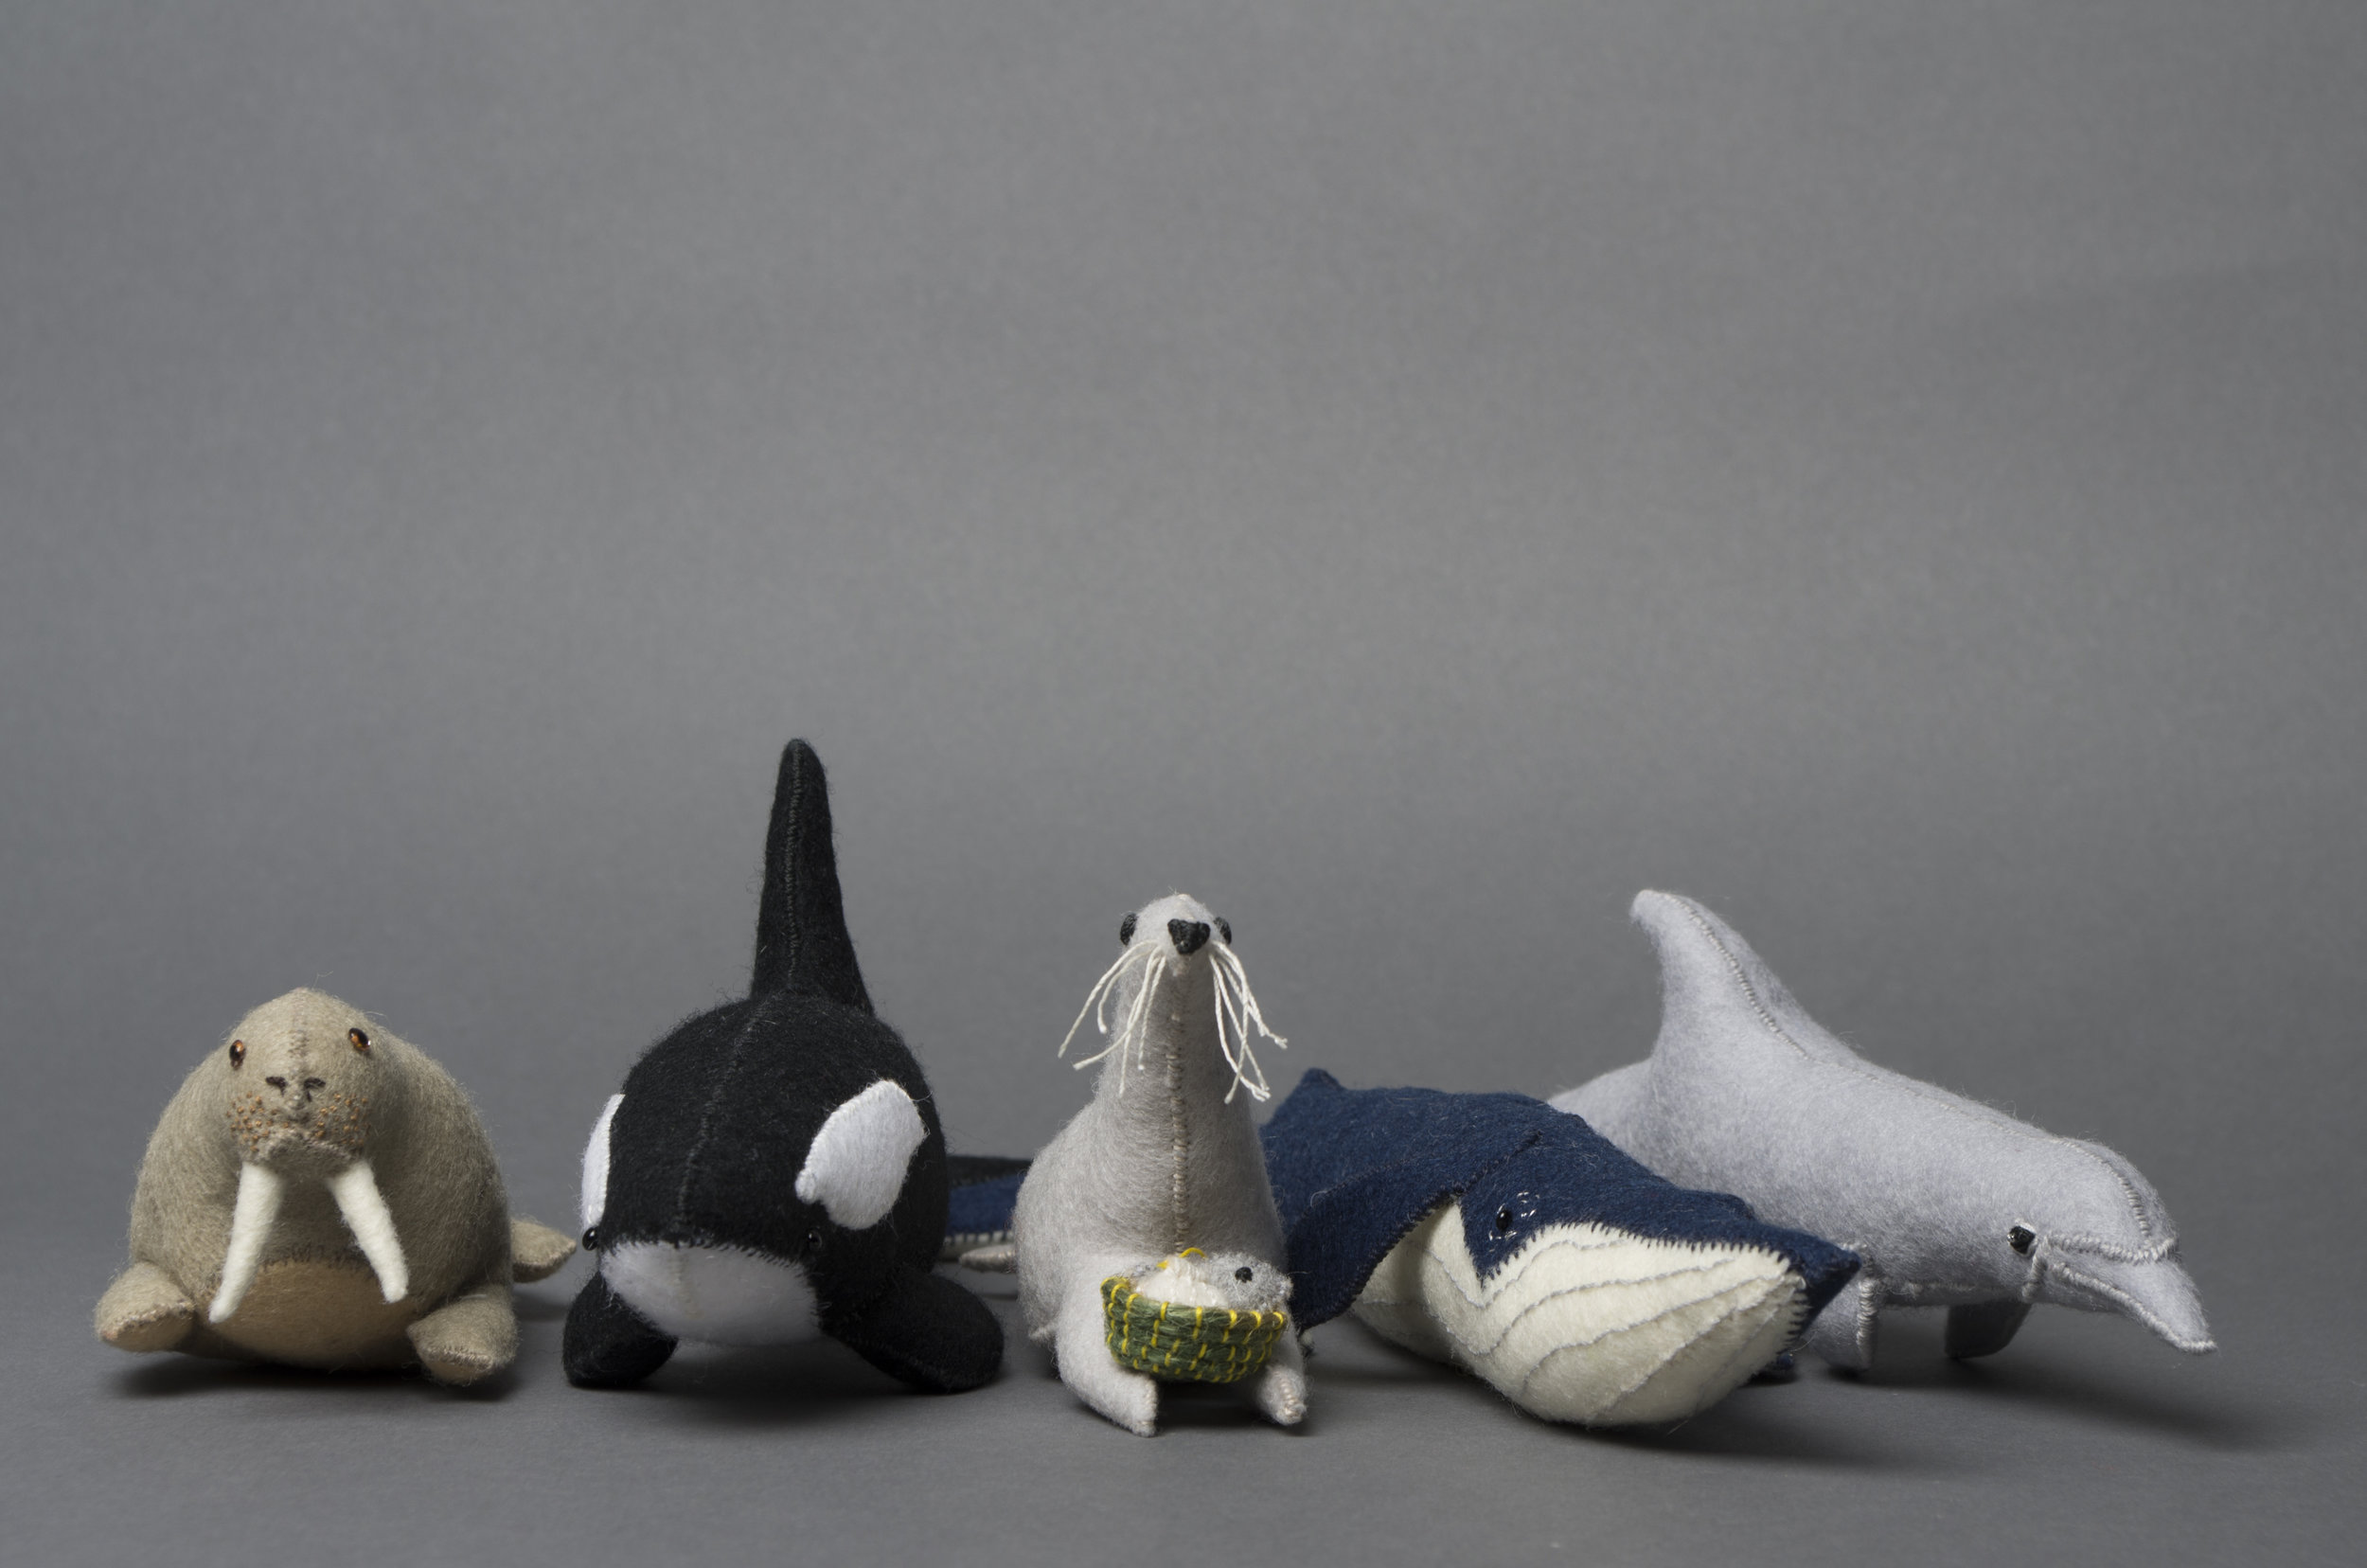 Lillian Bixler  Walrus, Orca, Seal, Blue Whale, Dolphin  woolen felt  £55 each